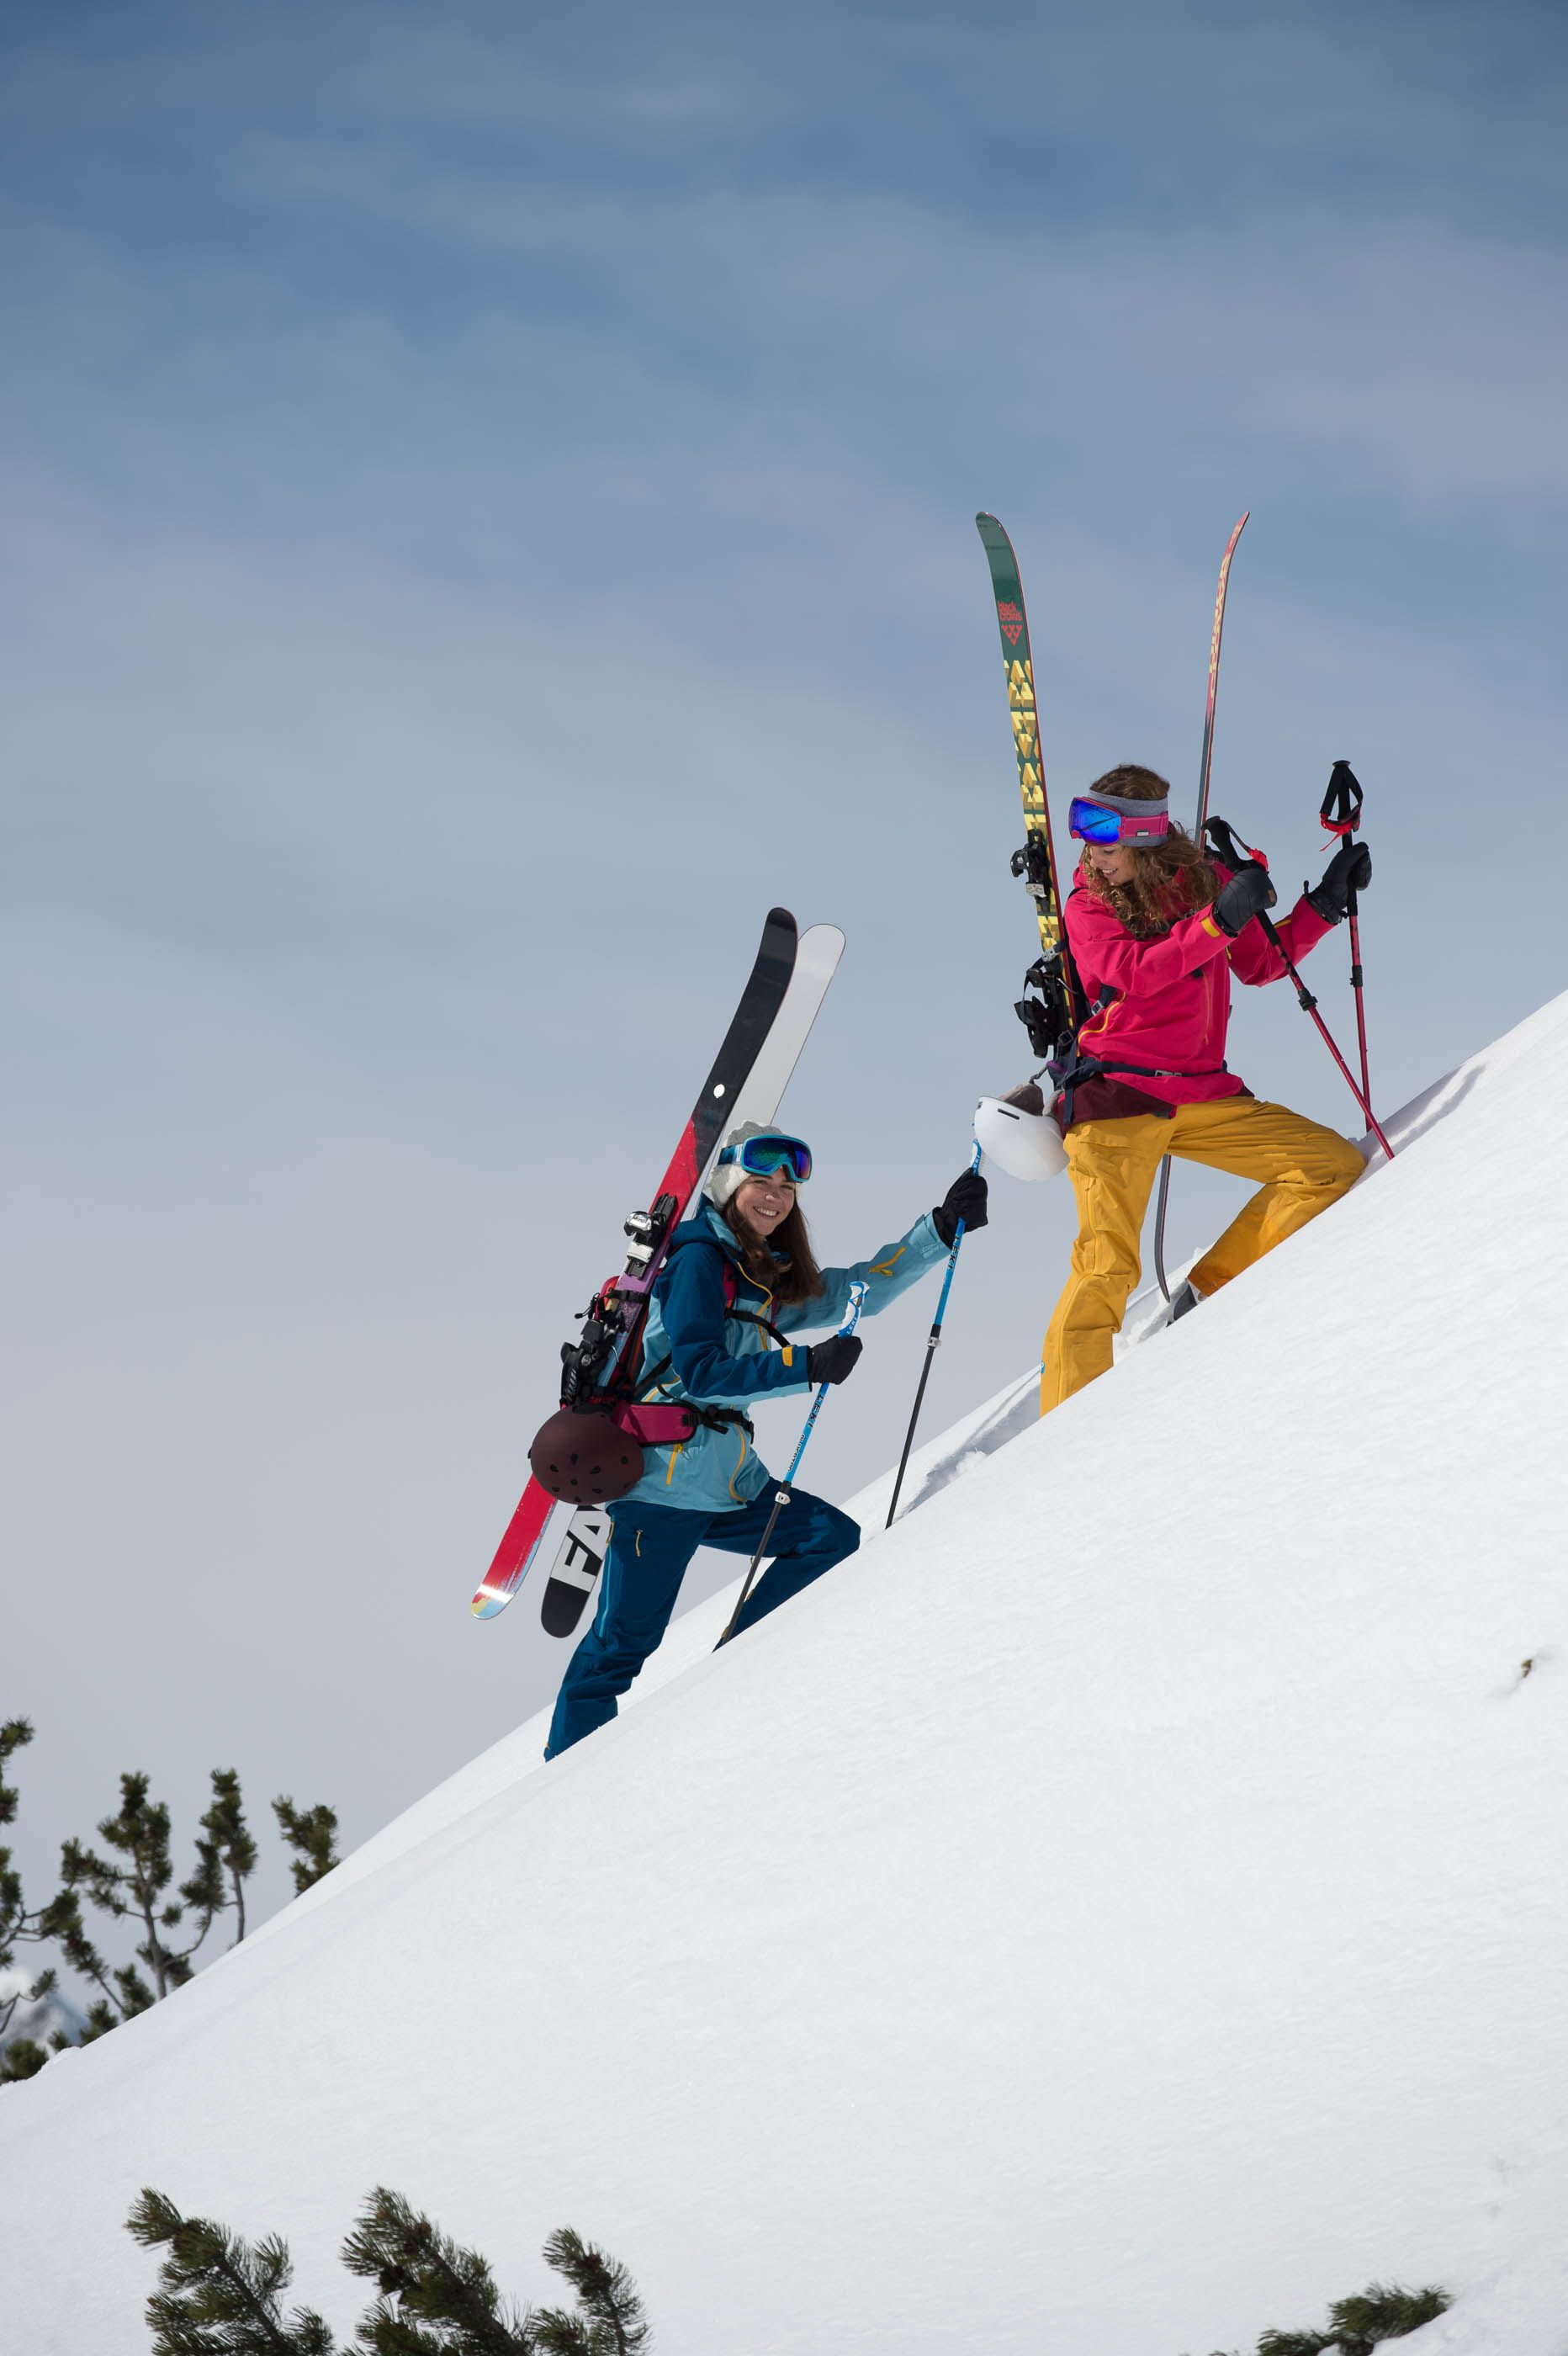 Pin by WomanMax.pl on Trening | Ski touring, Skiing, Snow wear